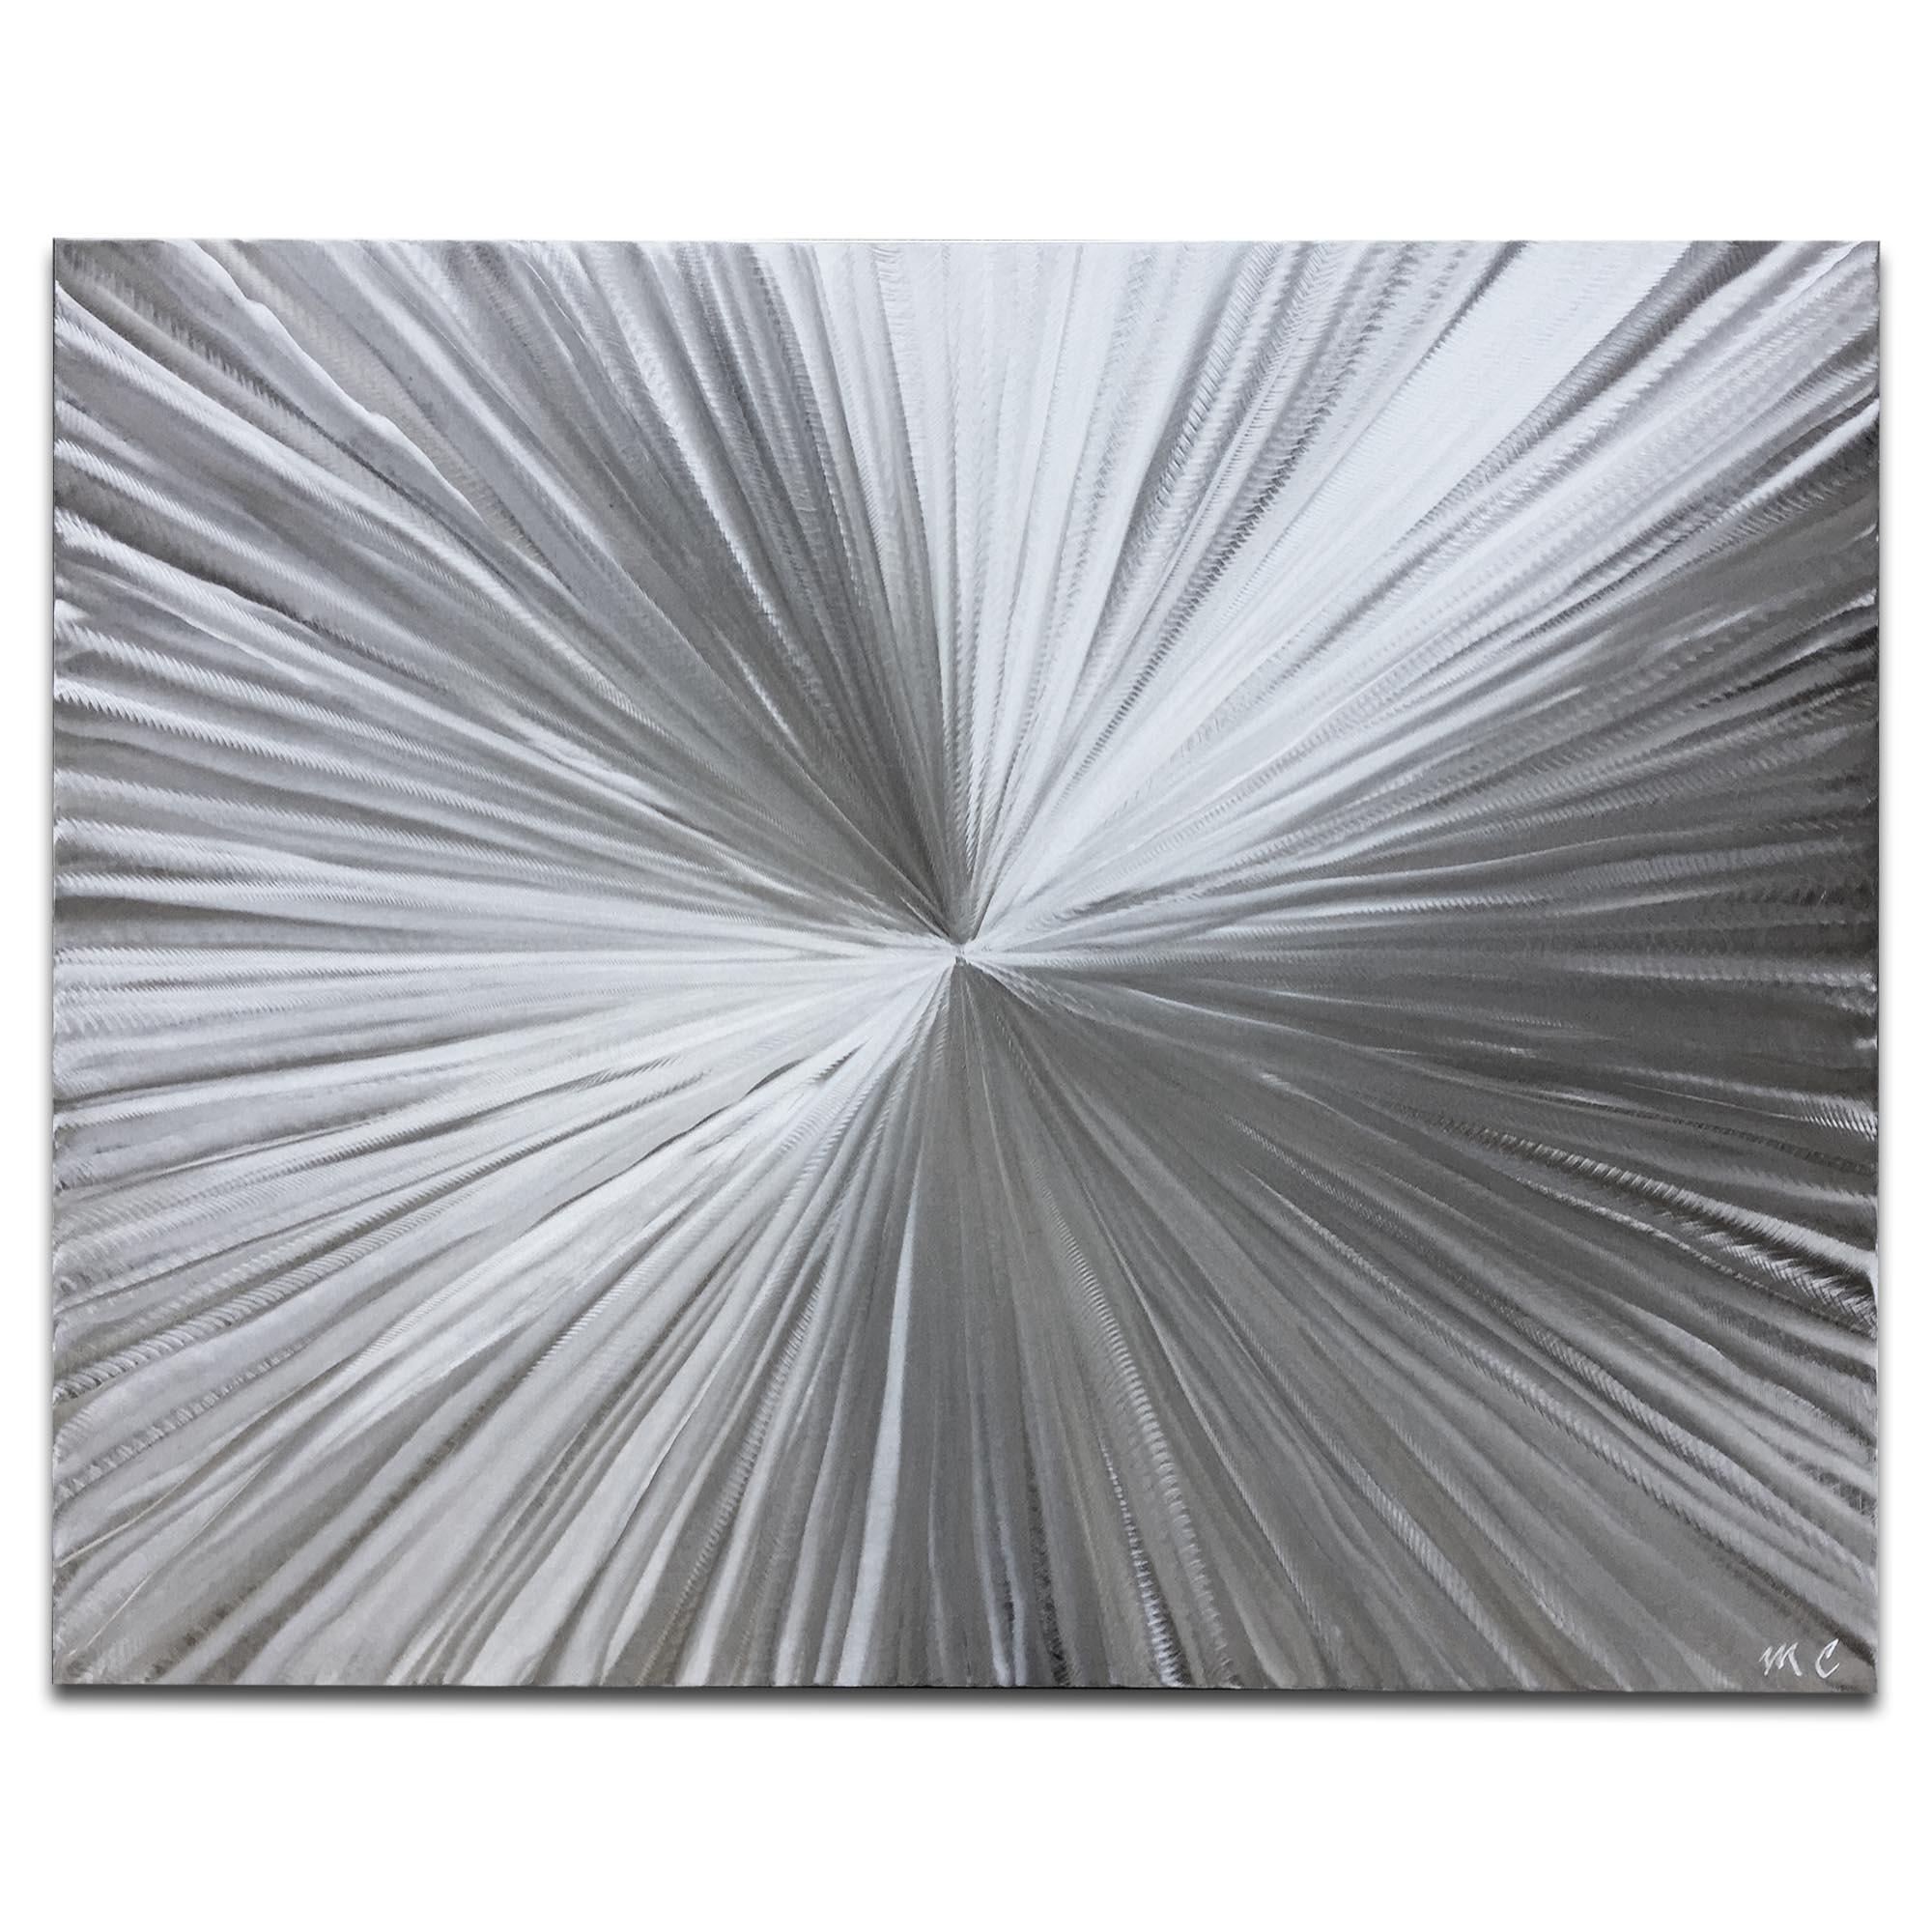 Bursting by Helena Martin - Sunburst Metal Art on Natural Aluminum